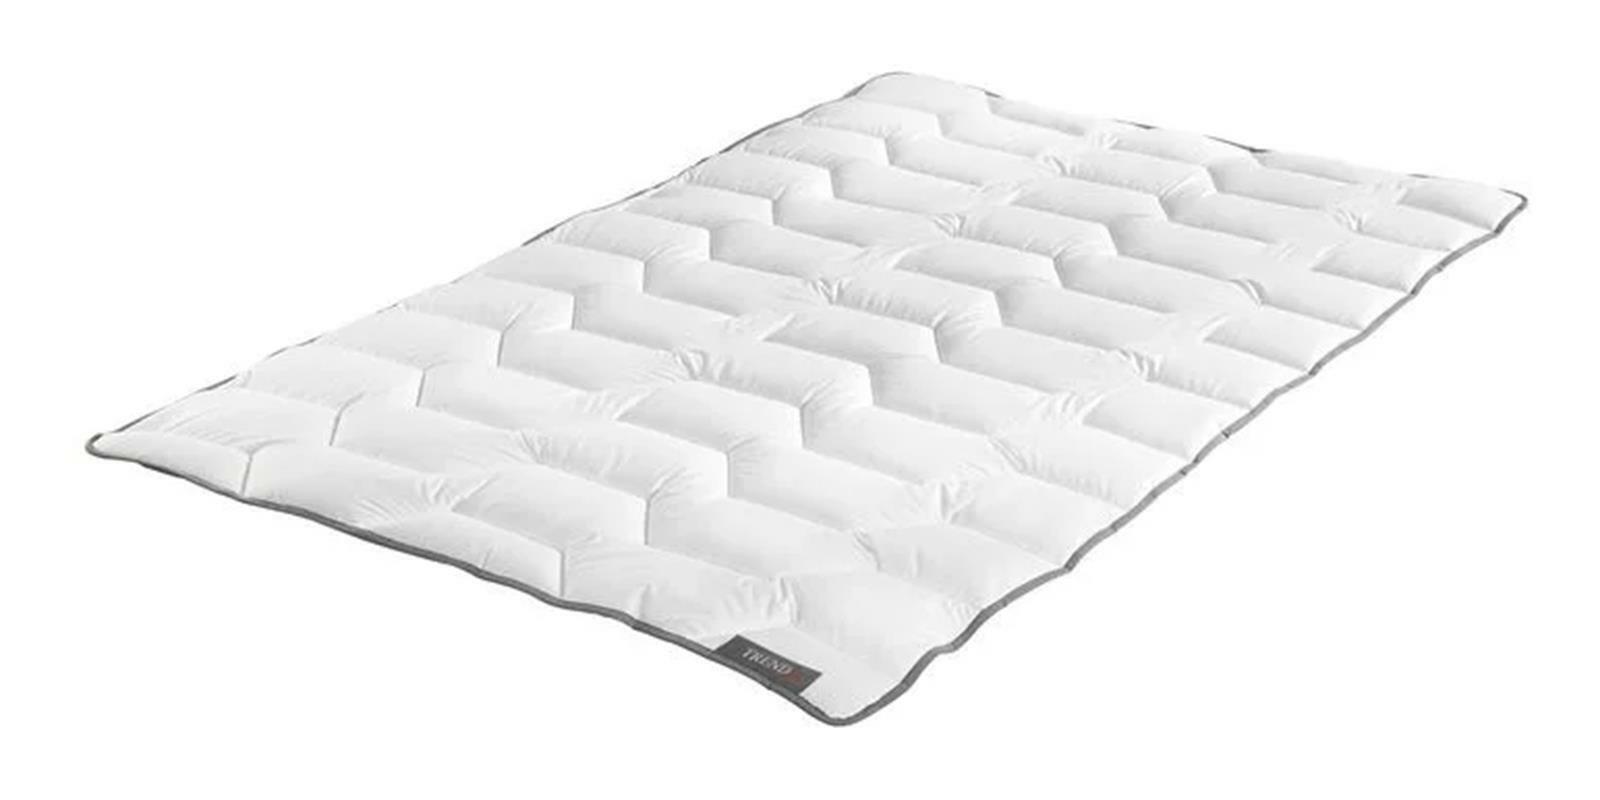 Badenia Trendline Bettdecke 135 x 200 cm Decke Schlafdecke